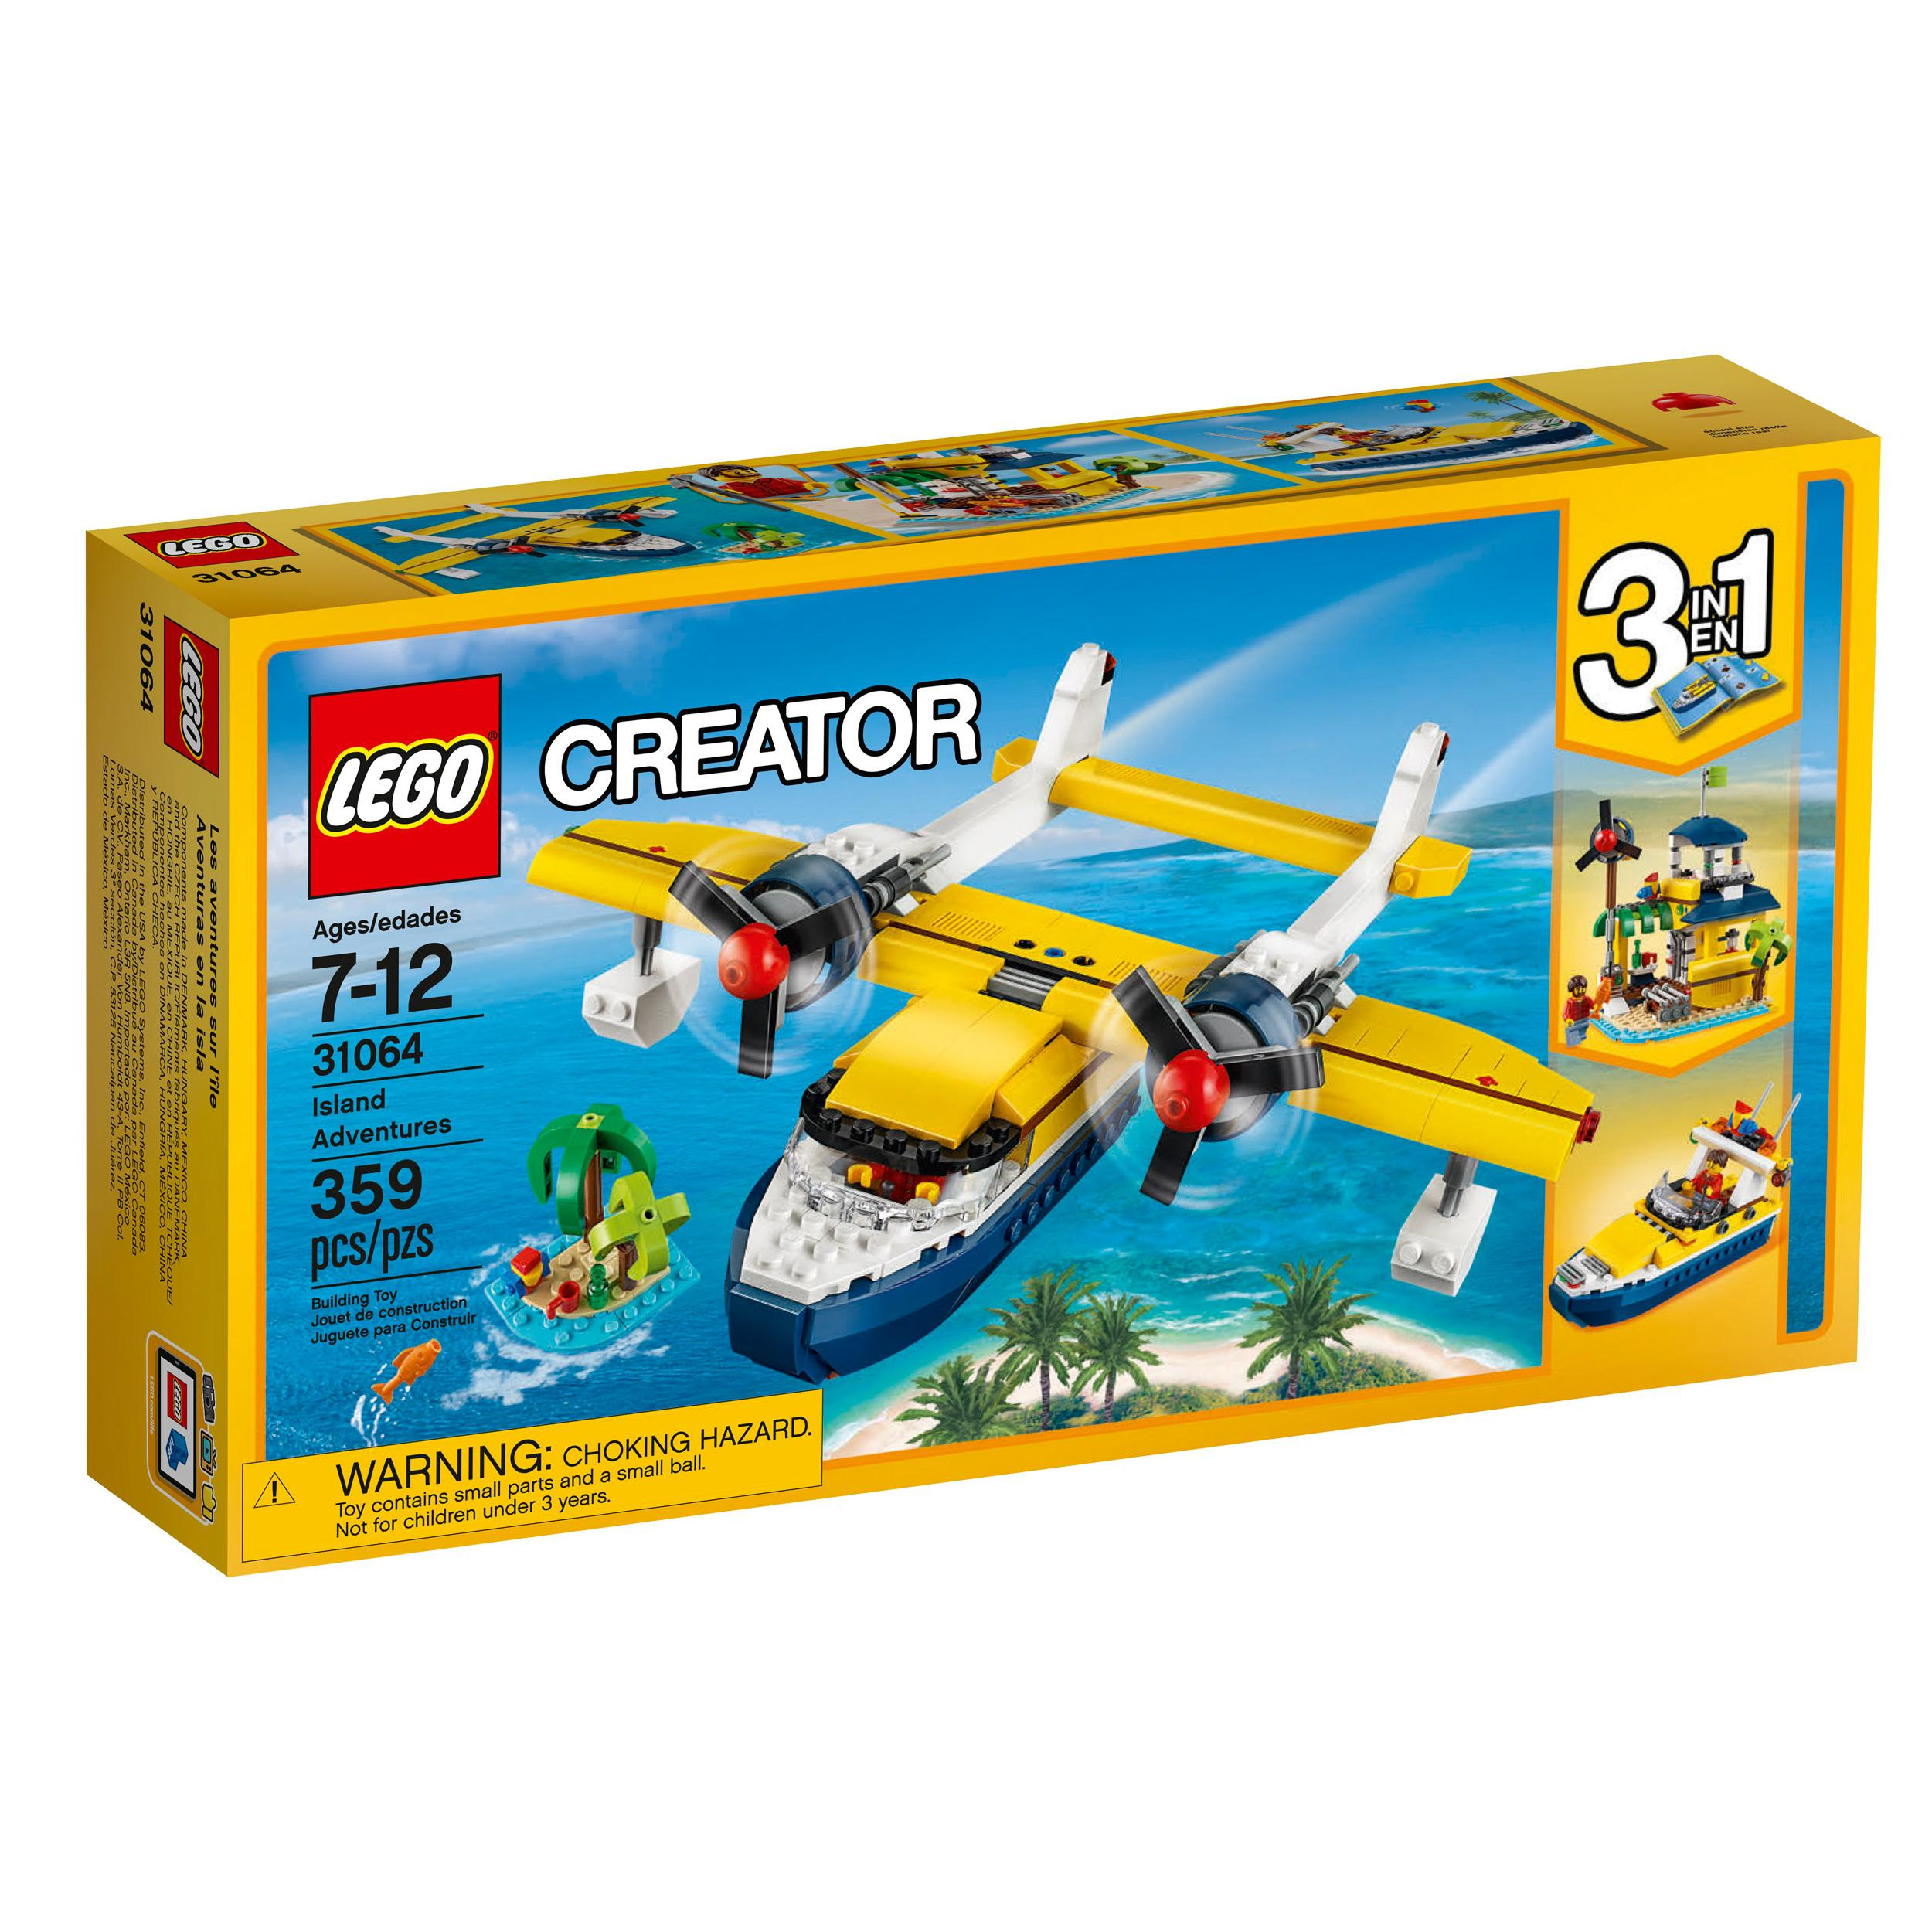 lego creator island adventures 31064 cool toy. Black Bedroom Furniture Sets. Home Design Ideas